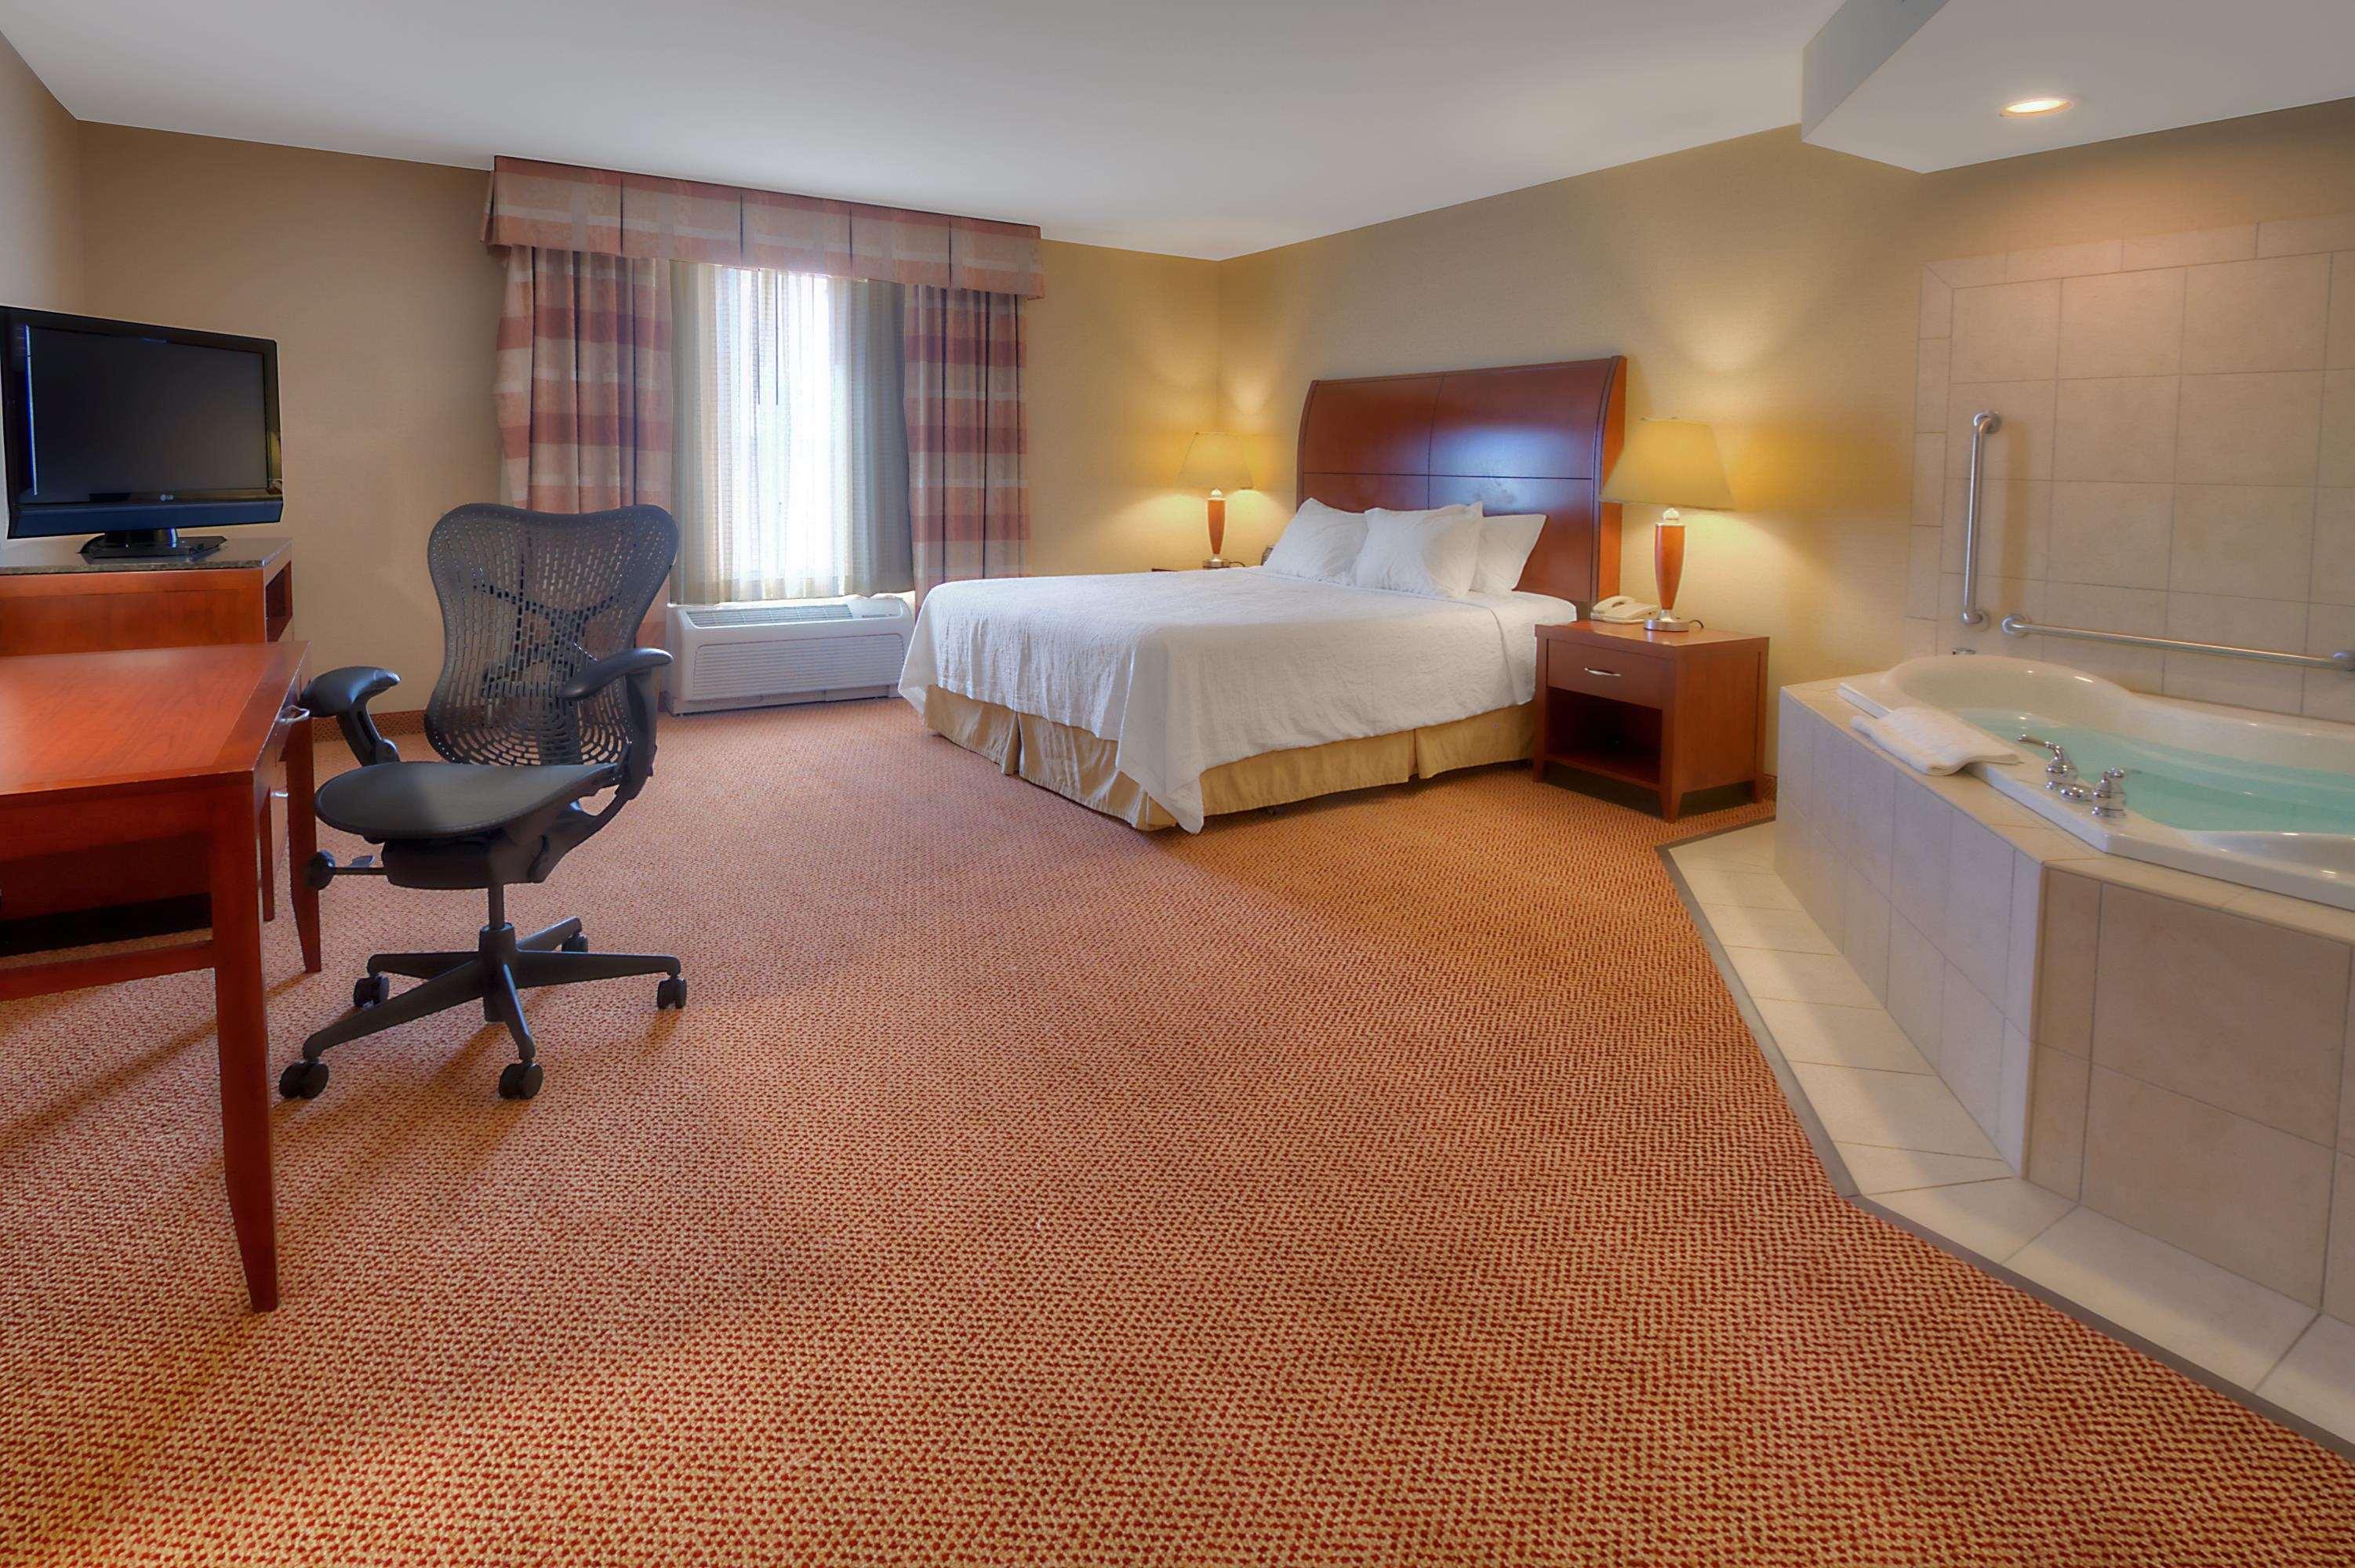 Hilton Garden Inn Great Falls image 13